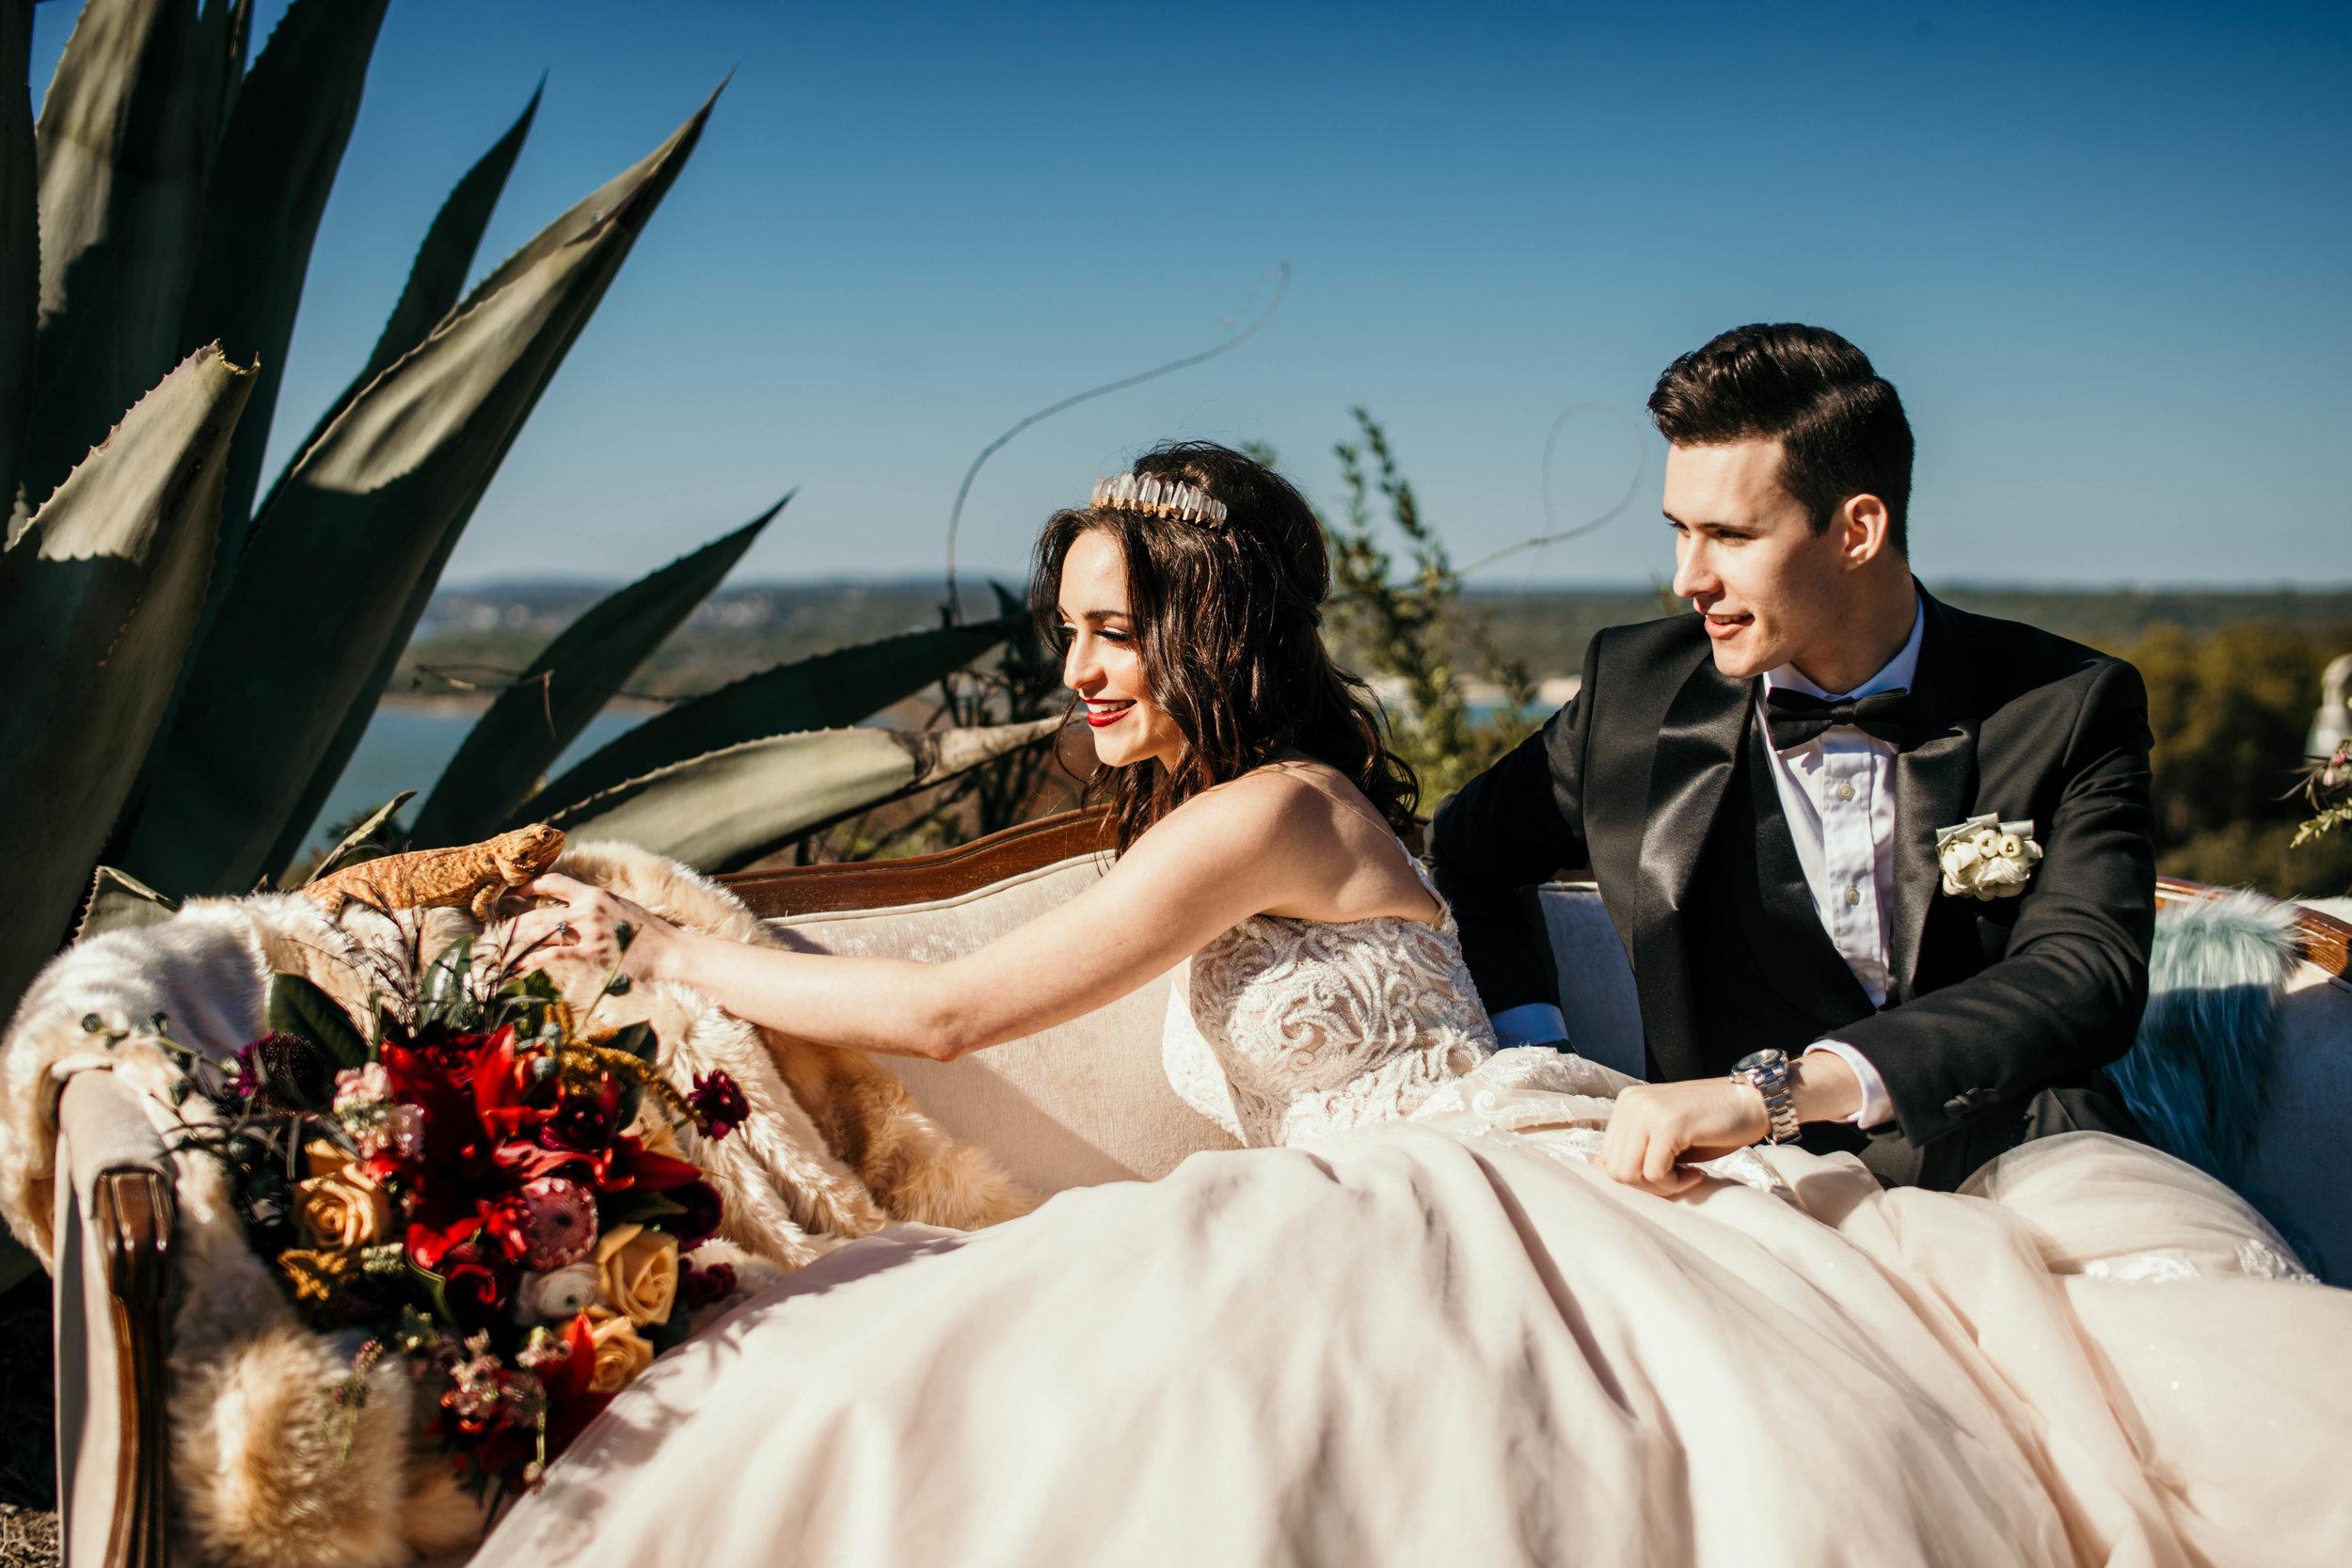 Austin Wedding Videographer - Dolls for Dolls (123 of 323).jpg